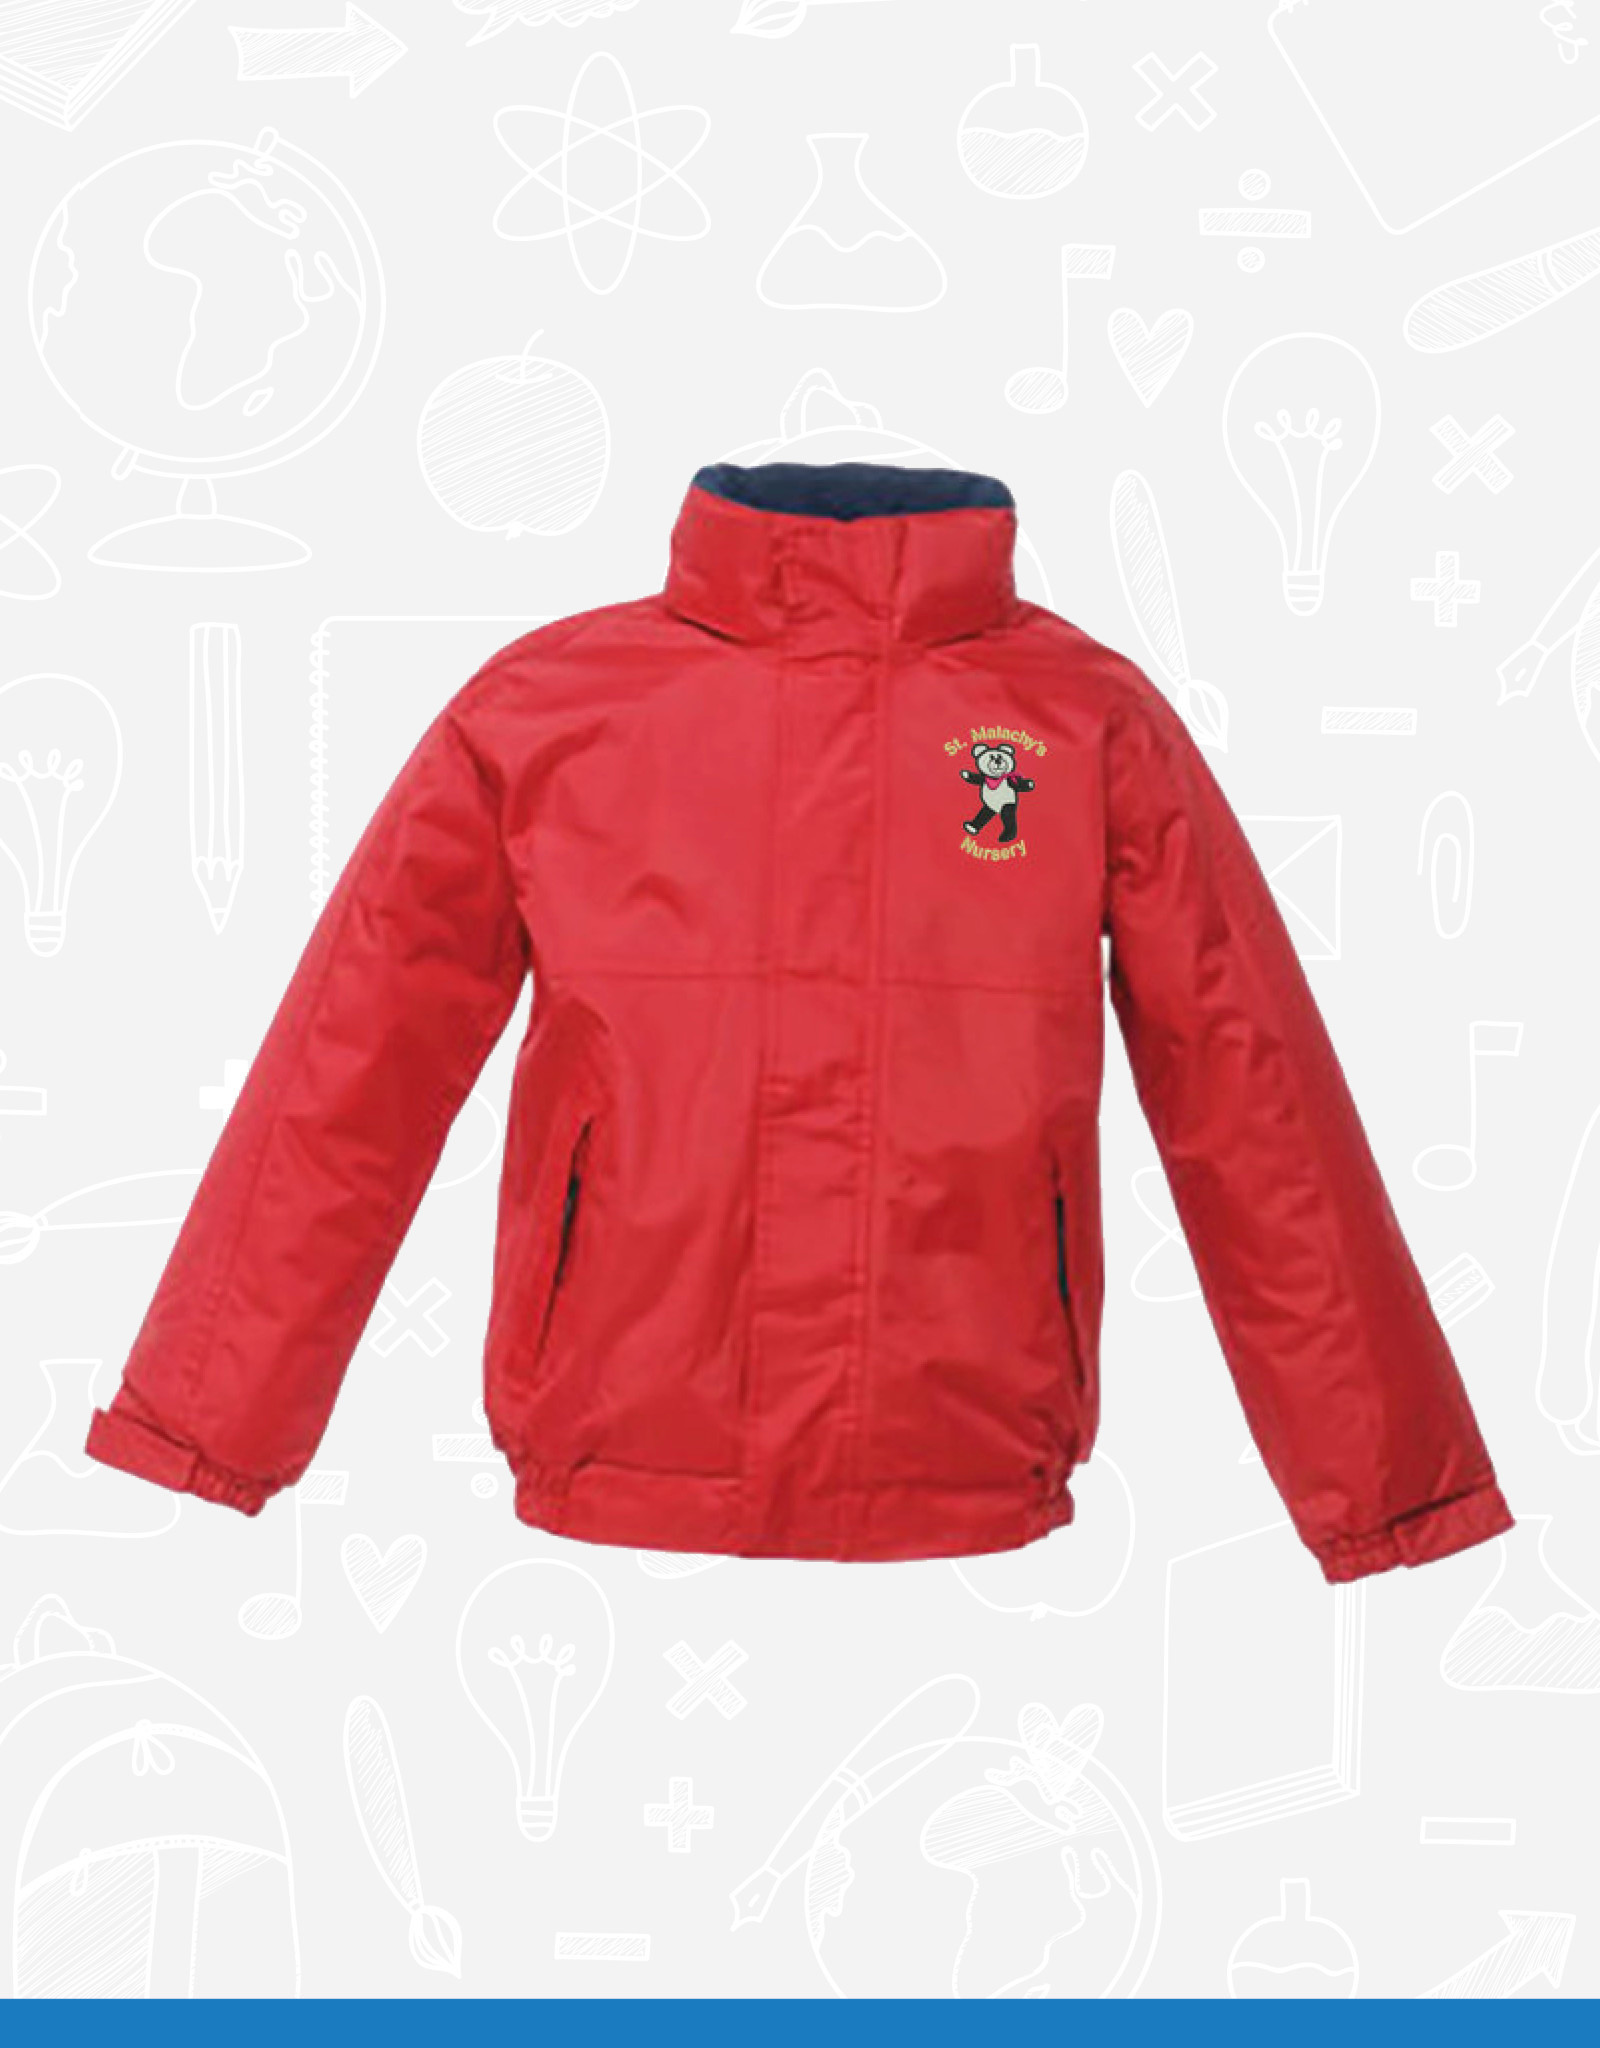 Regatta St Malachy's Nursery Jacket (RG244)